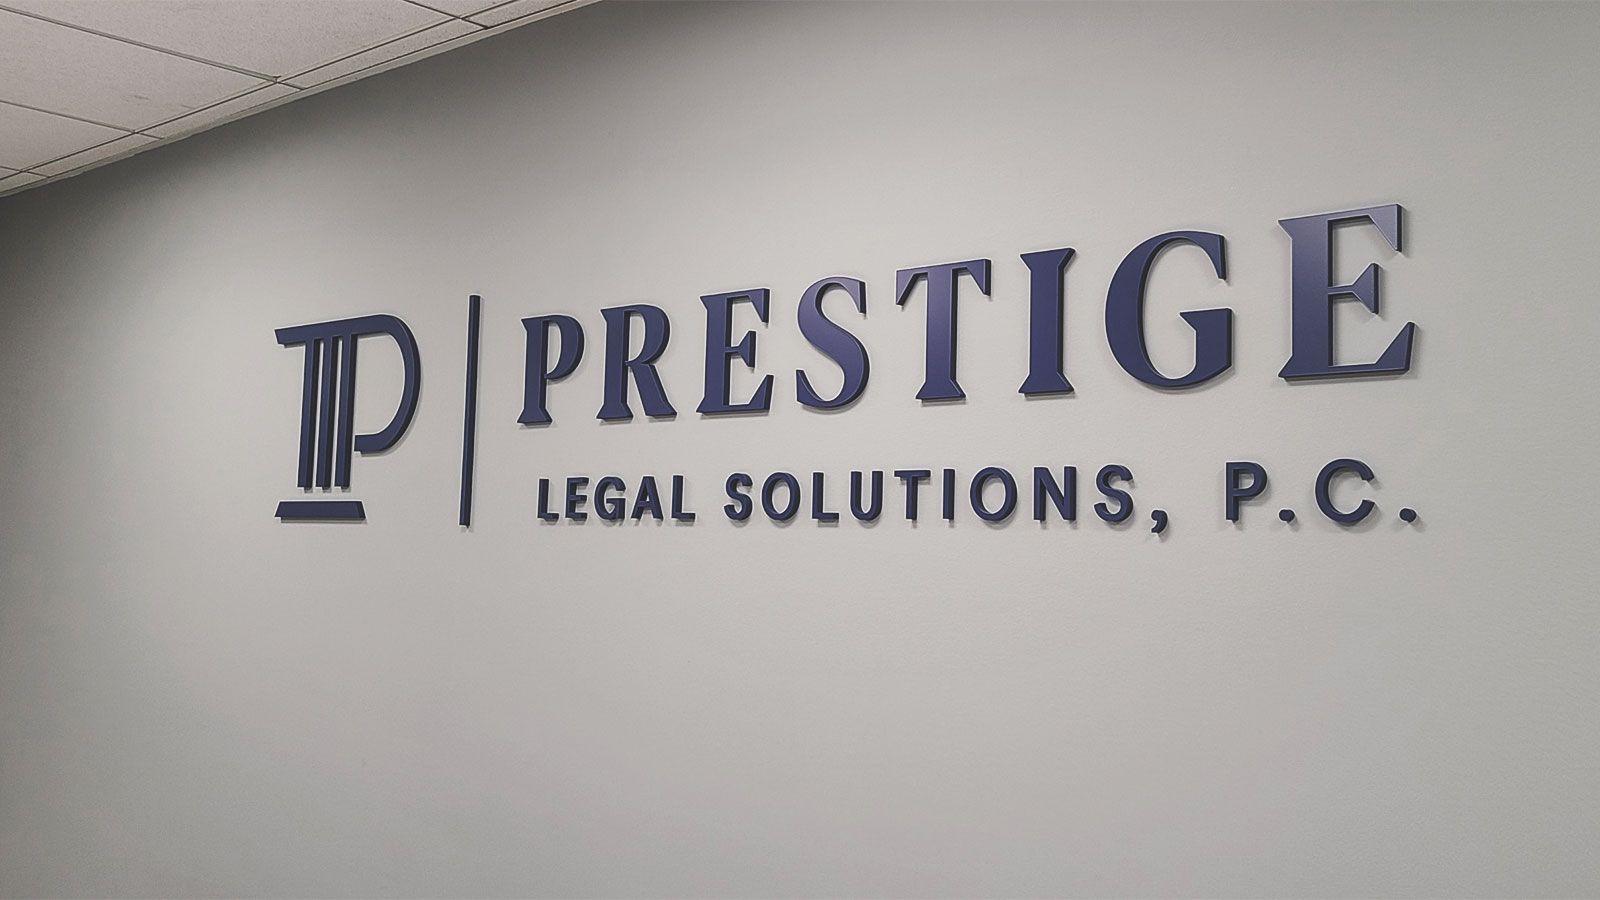 Prestige acrylic office sign